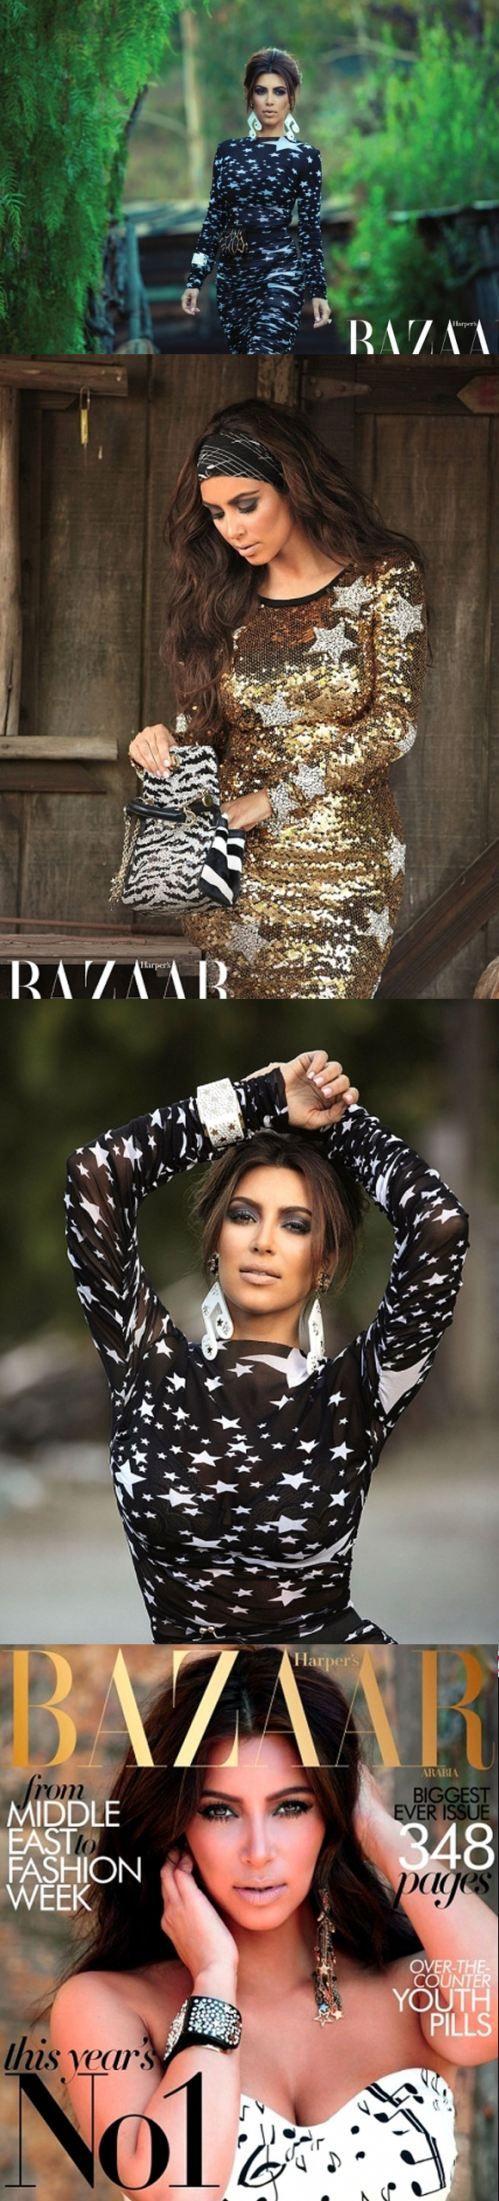 Kim Kardashian - Bazaar Magazine   The House of Beccaria~